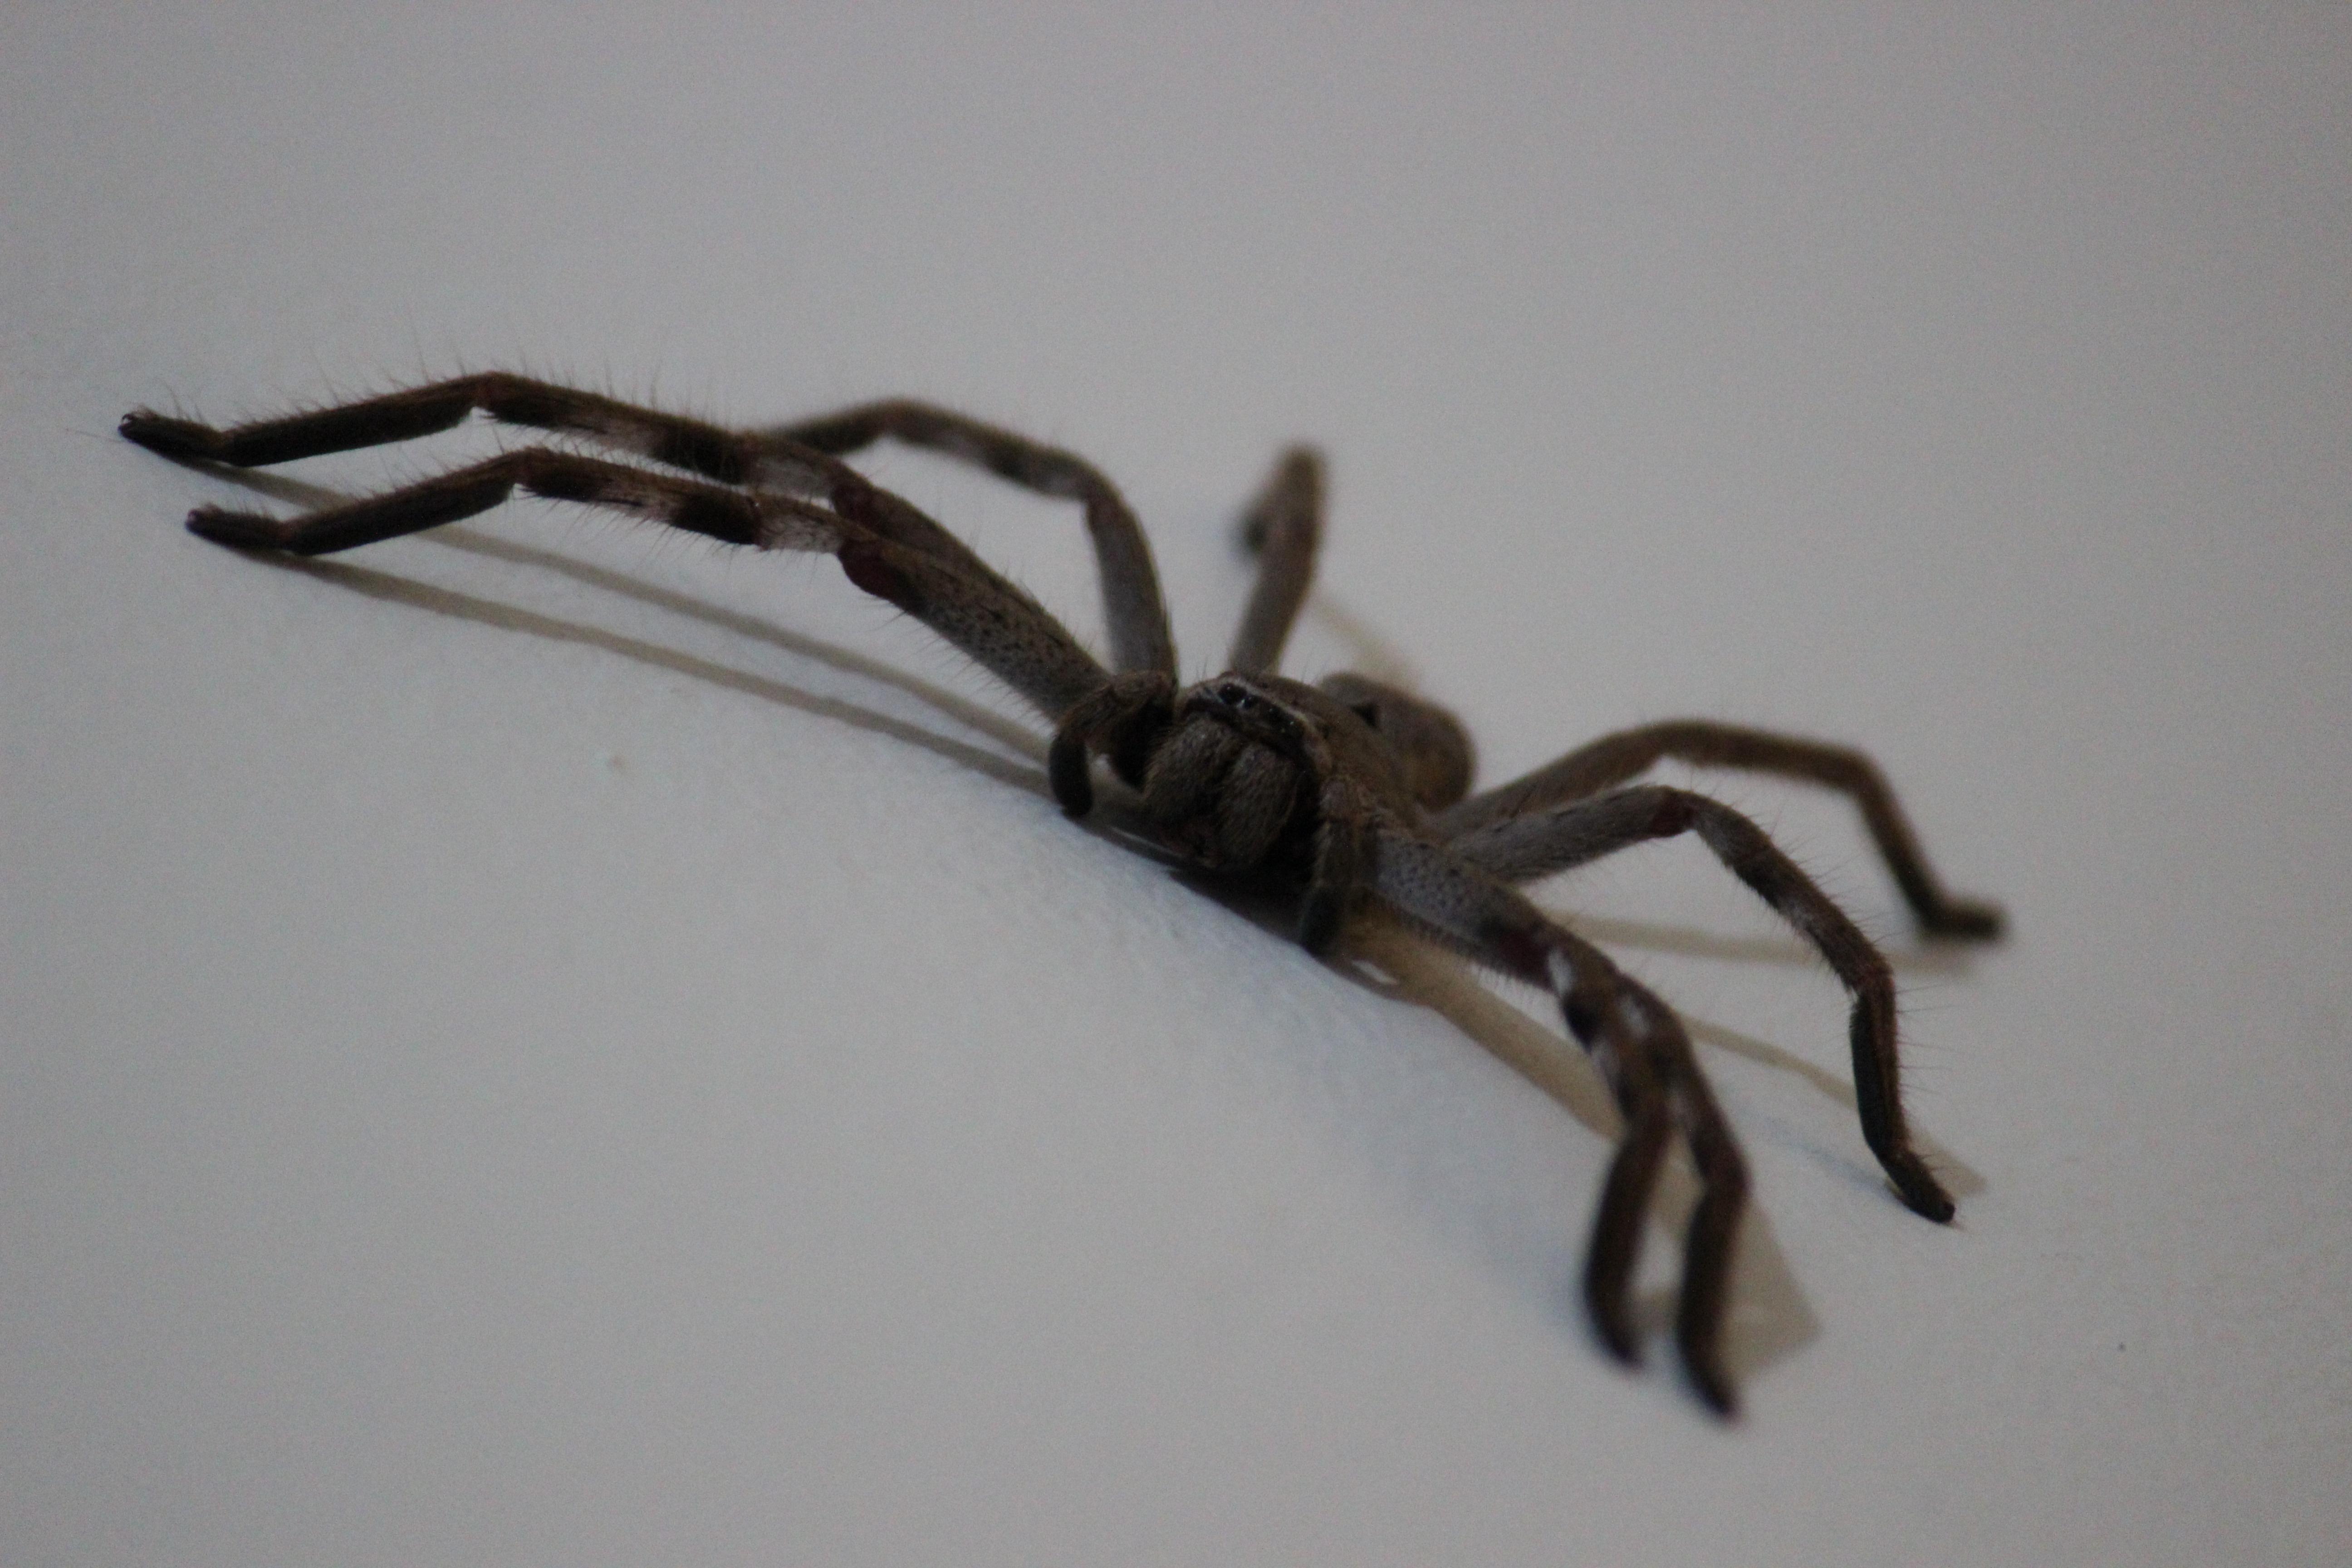 free images insect halloween bug black fauna invertebrate close up crawling crawl scary fear danger hairy arachnid creepy horror phobia - Phobia Halloween